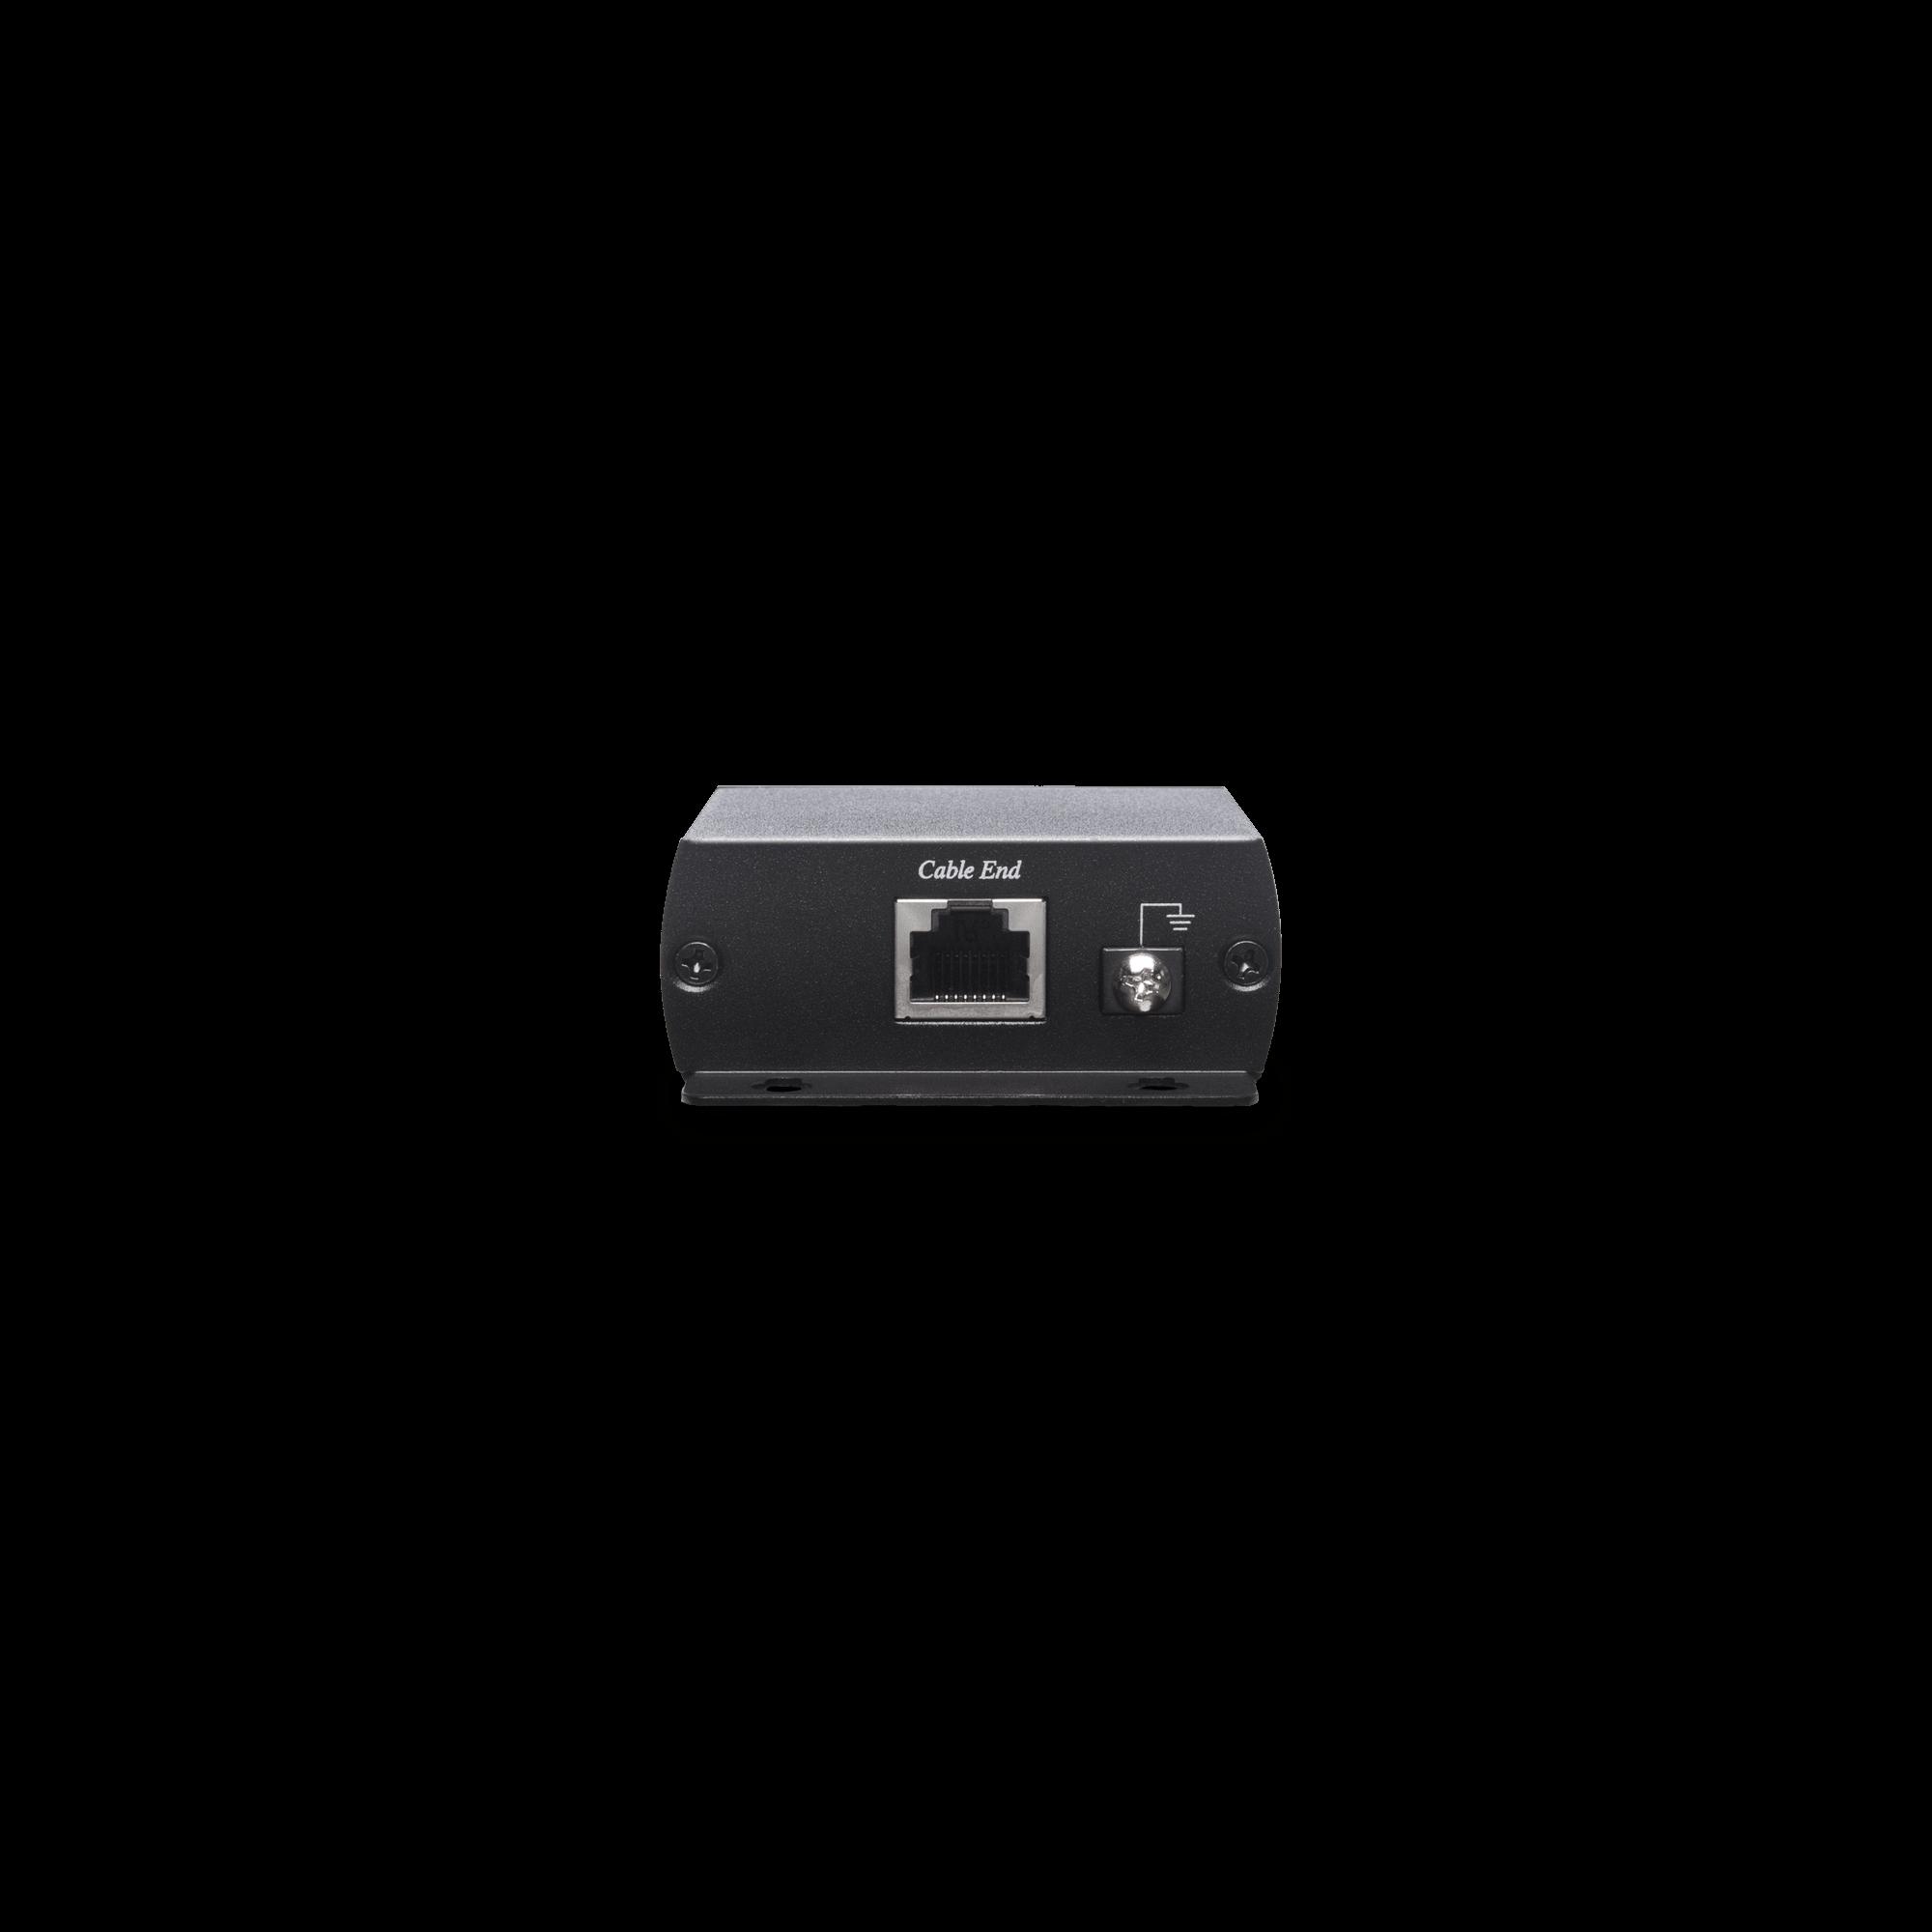 HDBaseT/10G Ethernet Surge Protector